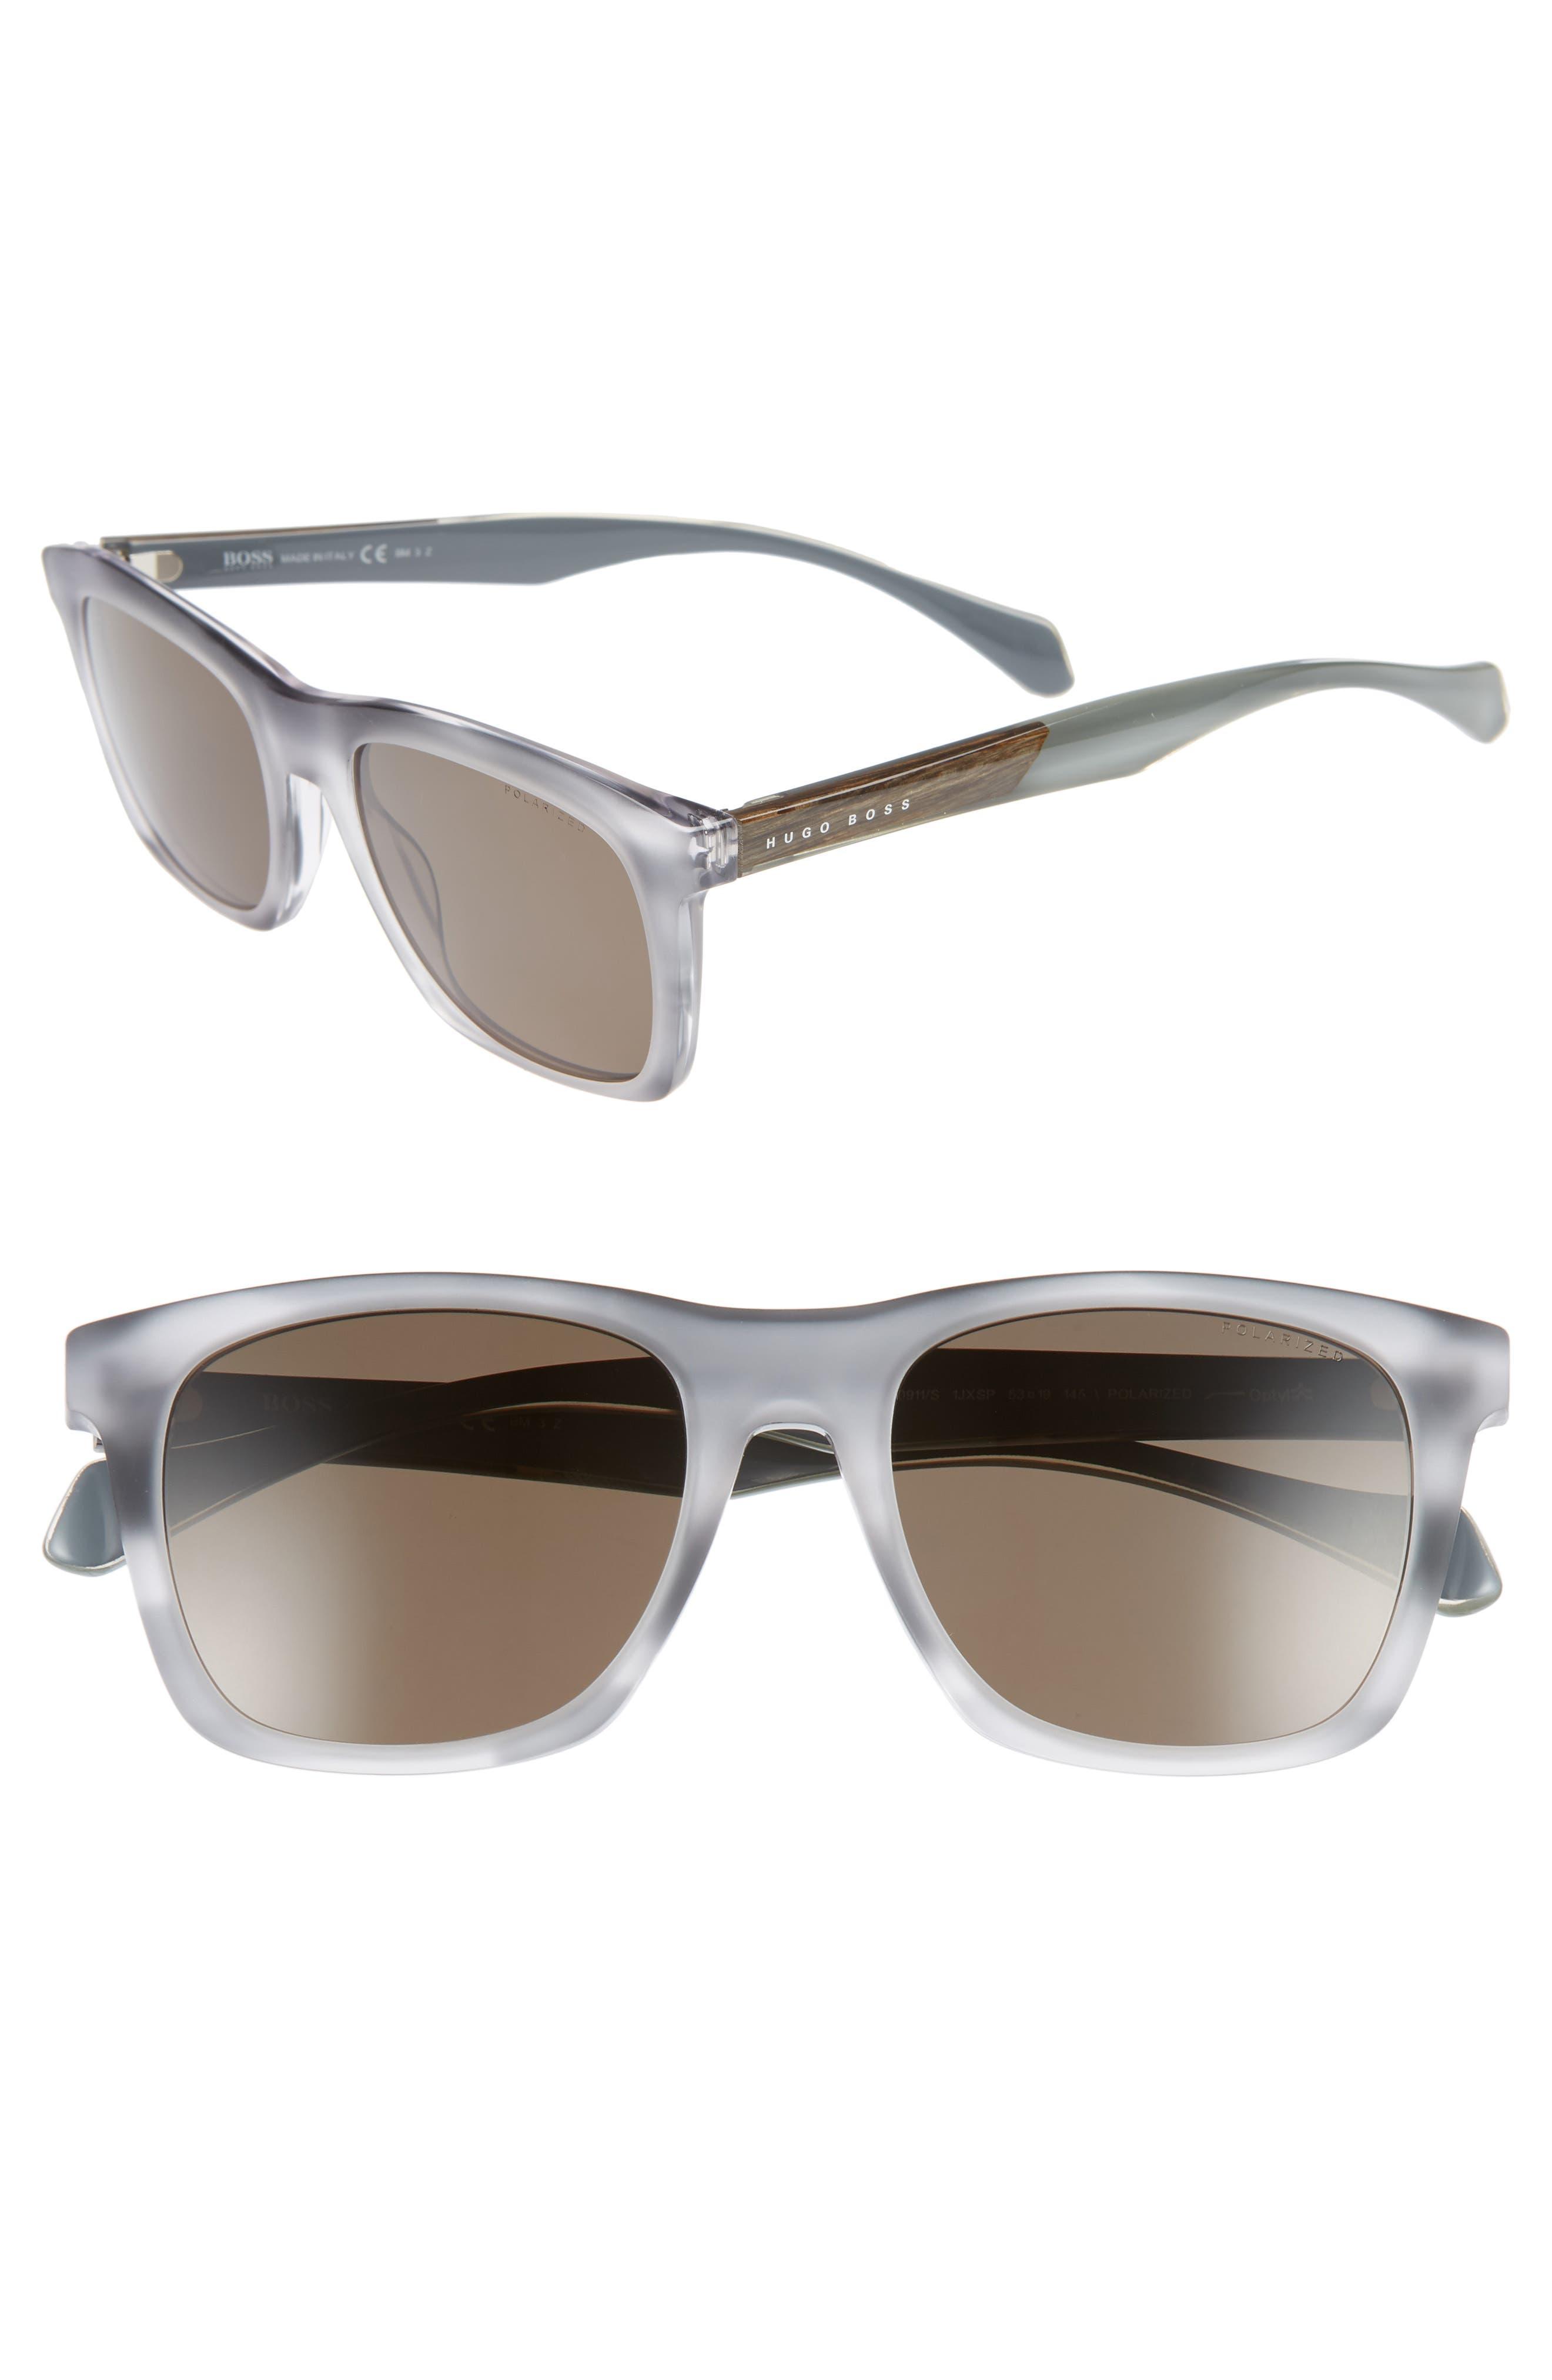 53mm Polarized Sunglasses,                         Main,                         color, GREY/ BRONZE